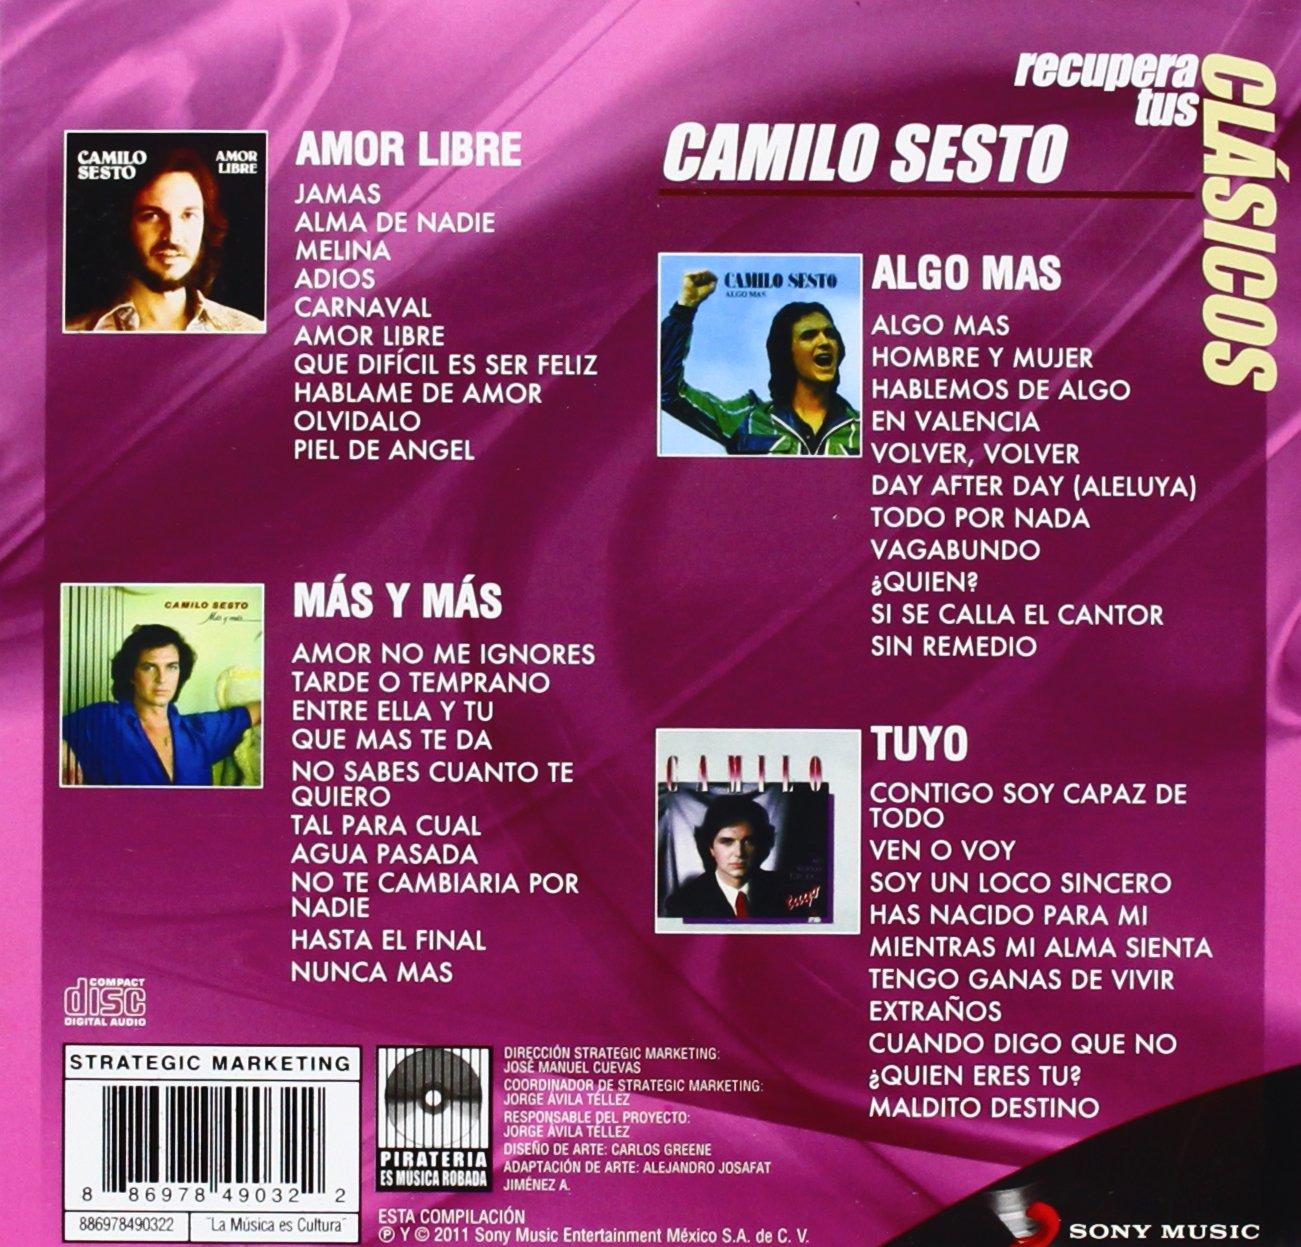 Recupera Tus Clasicos by Sony Music